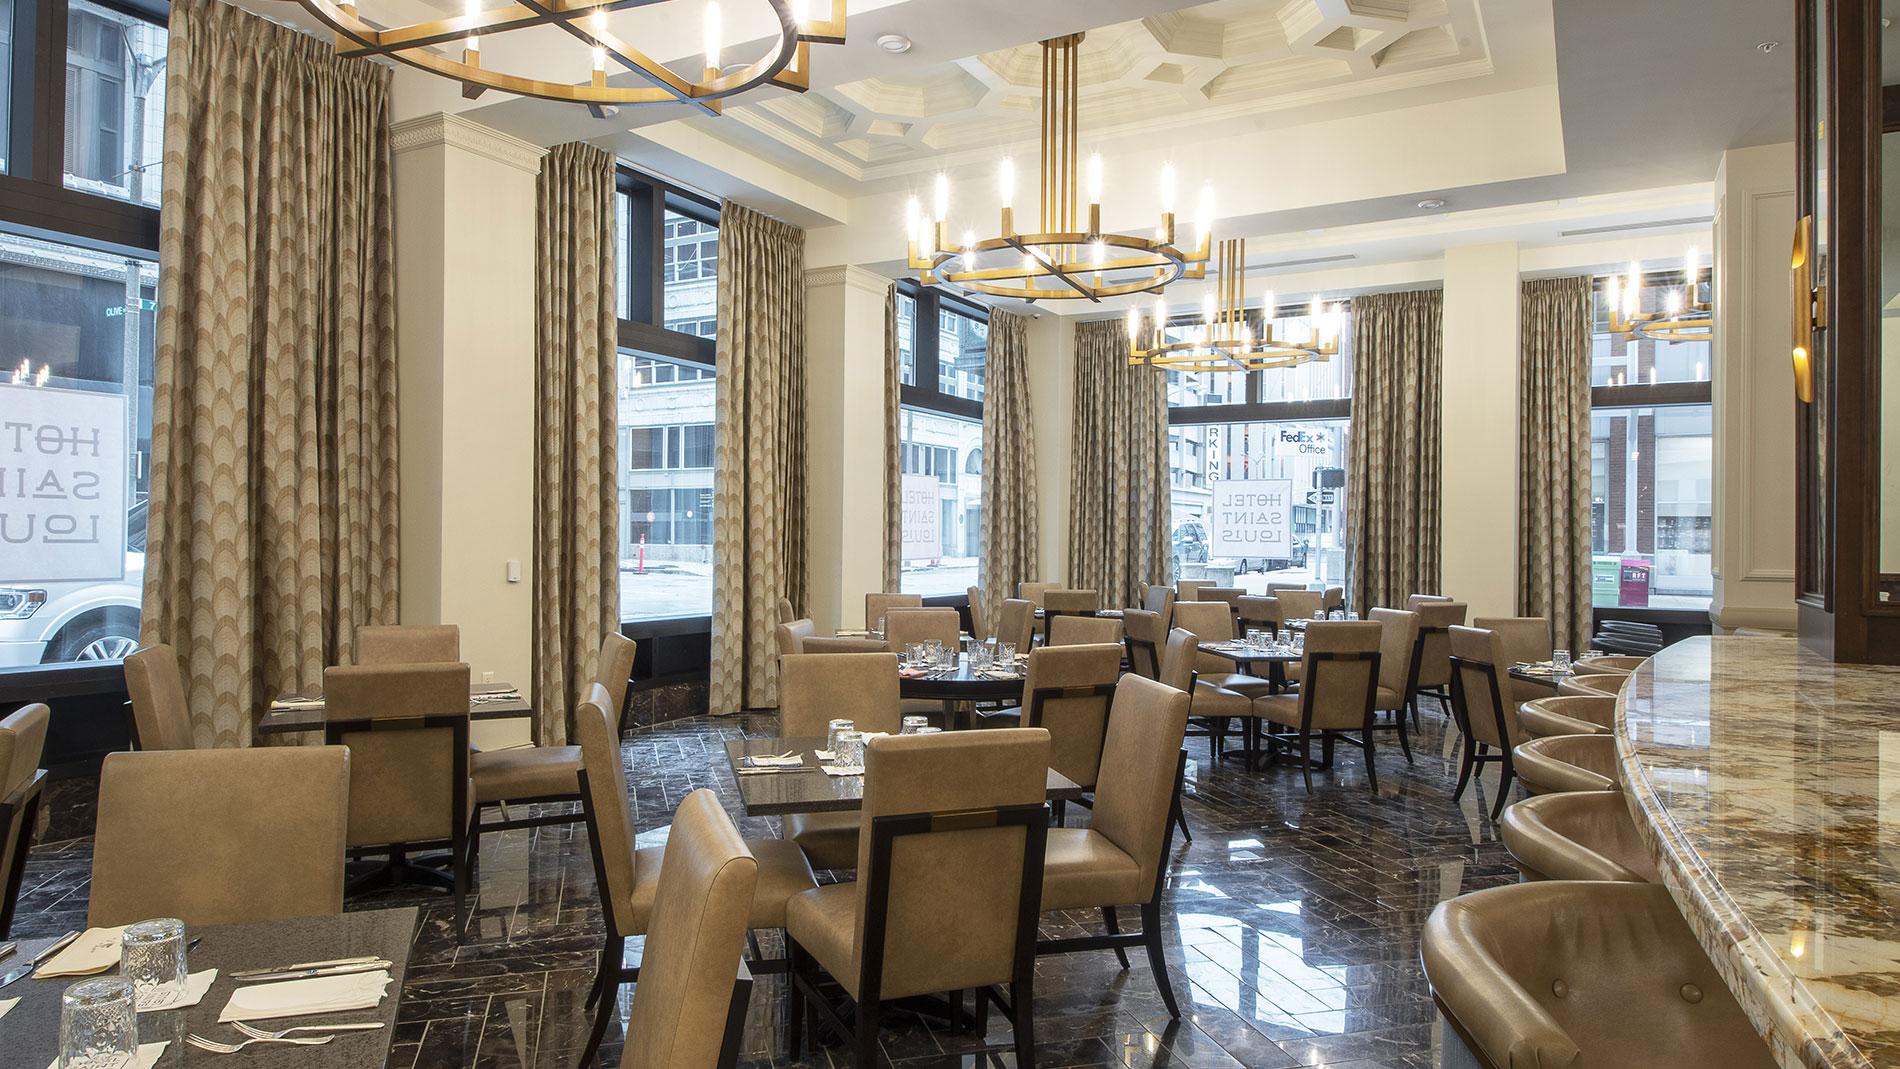 union 30 restaurant at hotel saint louis